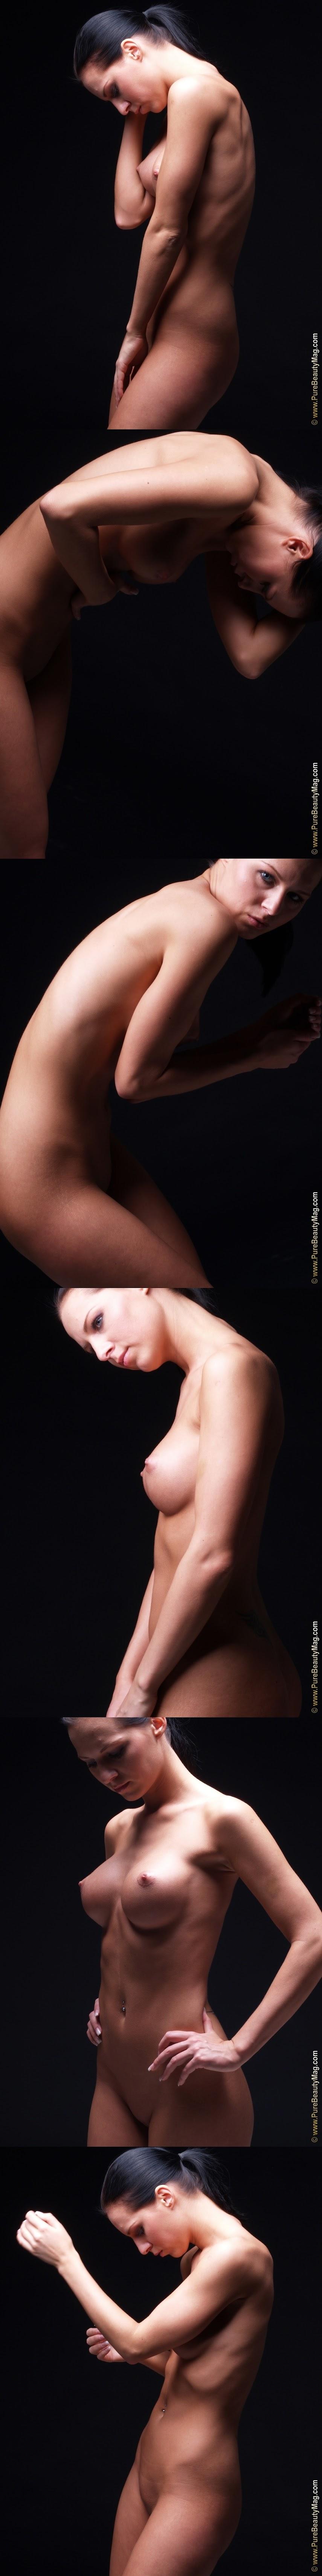 PureBeautyMag PBM  - 2005-01-17 -  s11744 - Ilona - Tranquility - 2560px - Girlsdelta